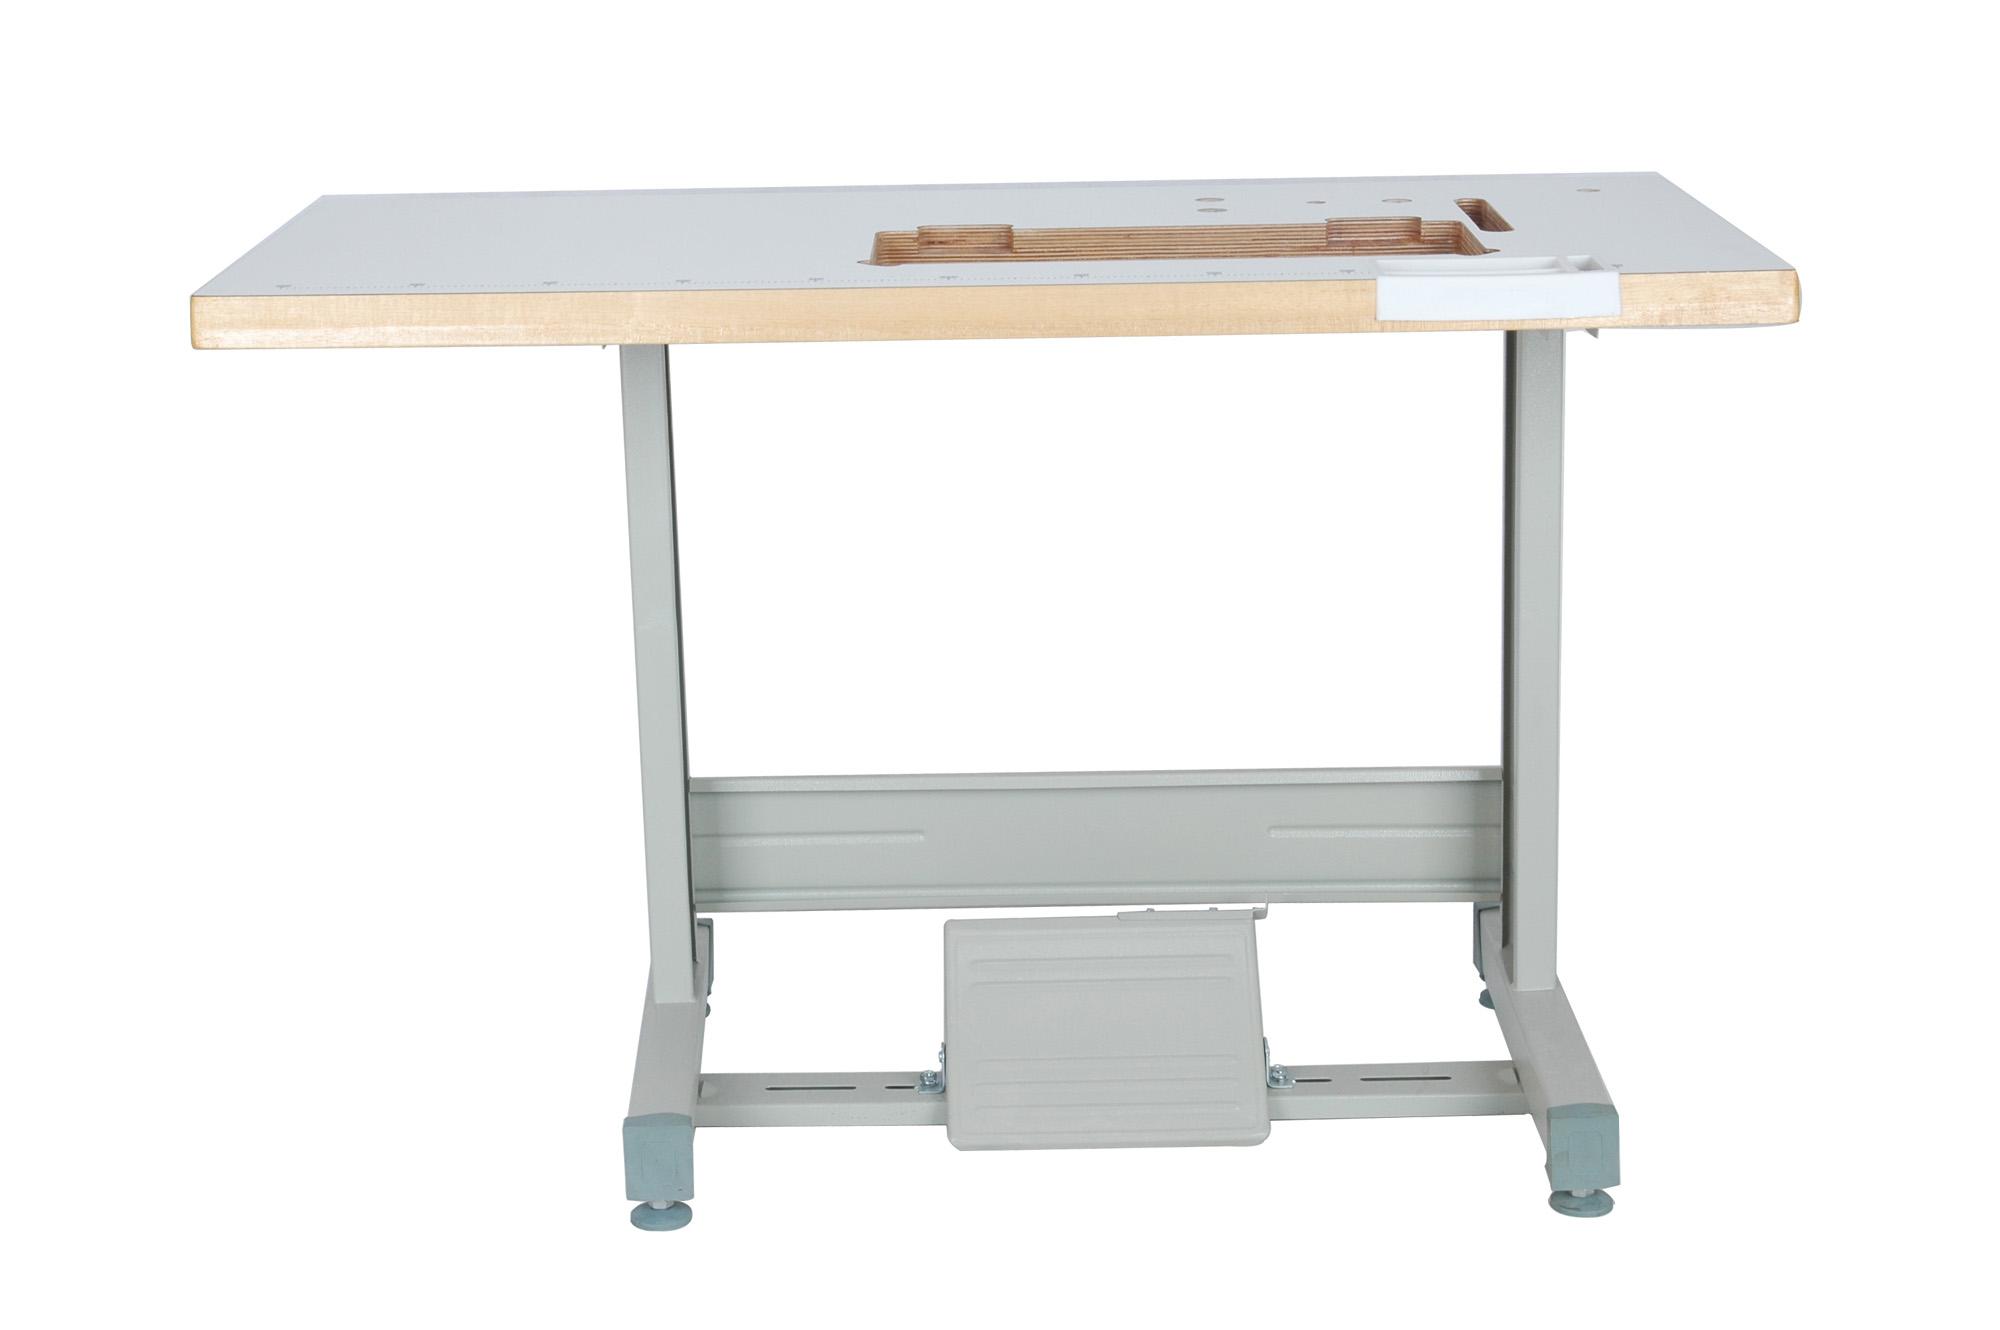 Coches manuales mesa para maquina de coser industrial - Mesa para maquina de coser ikea ...